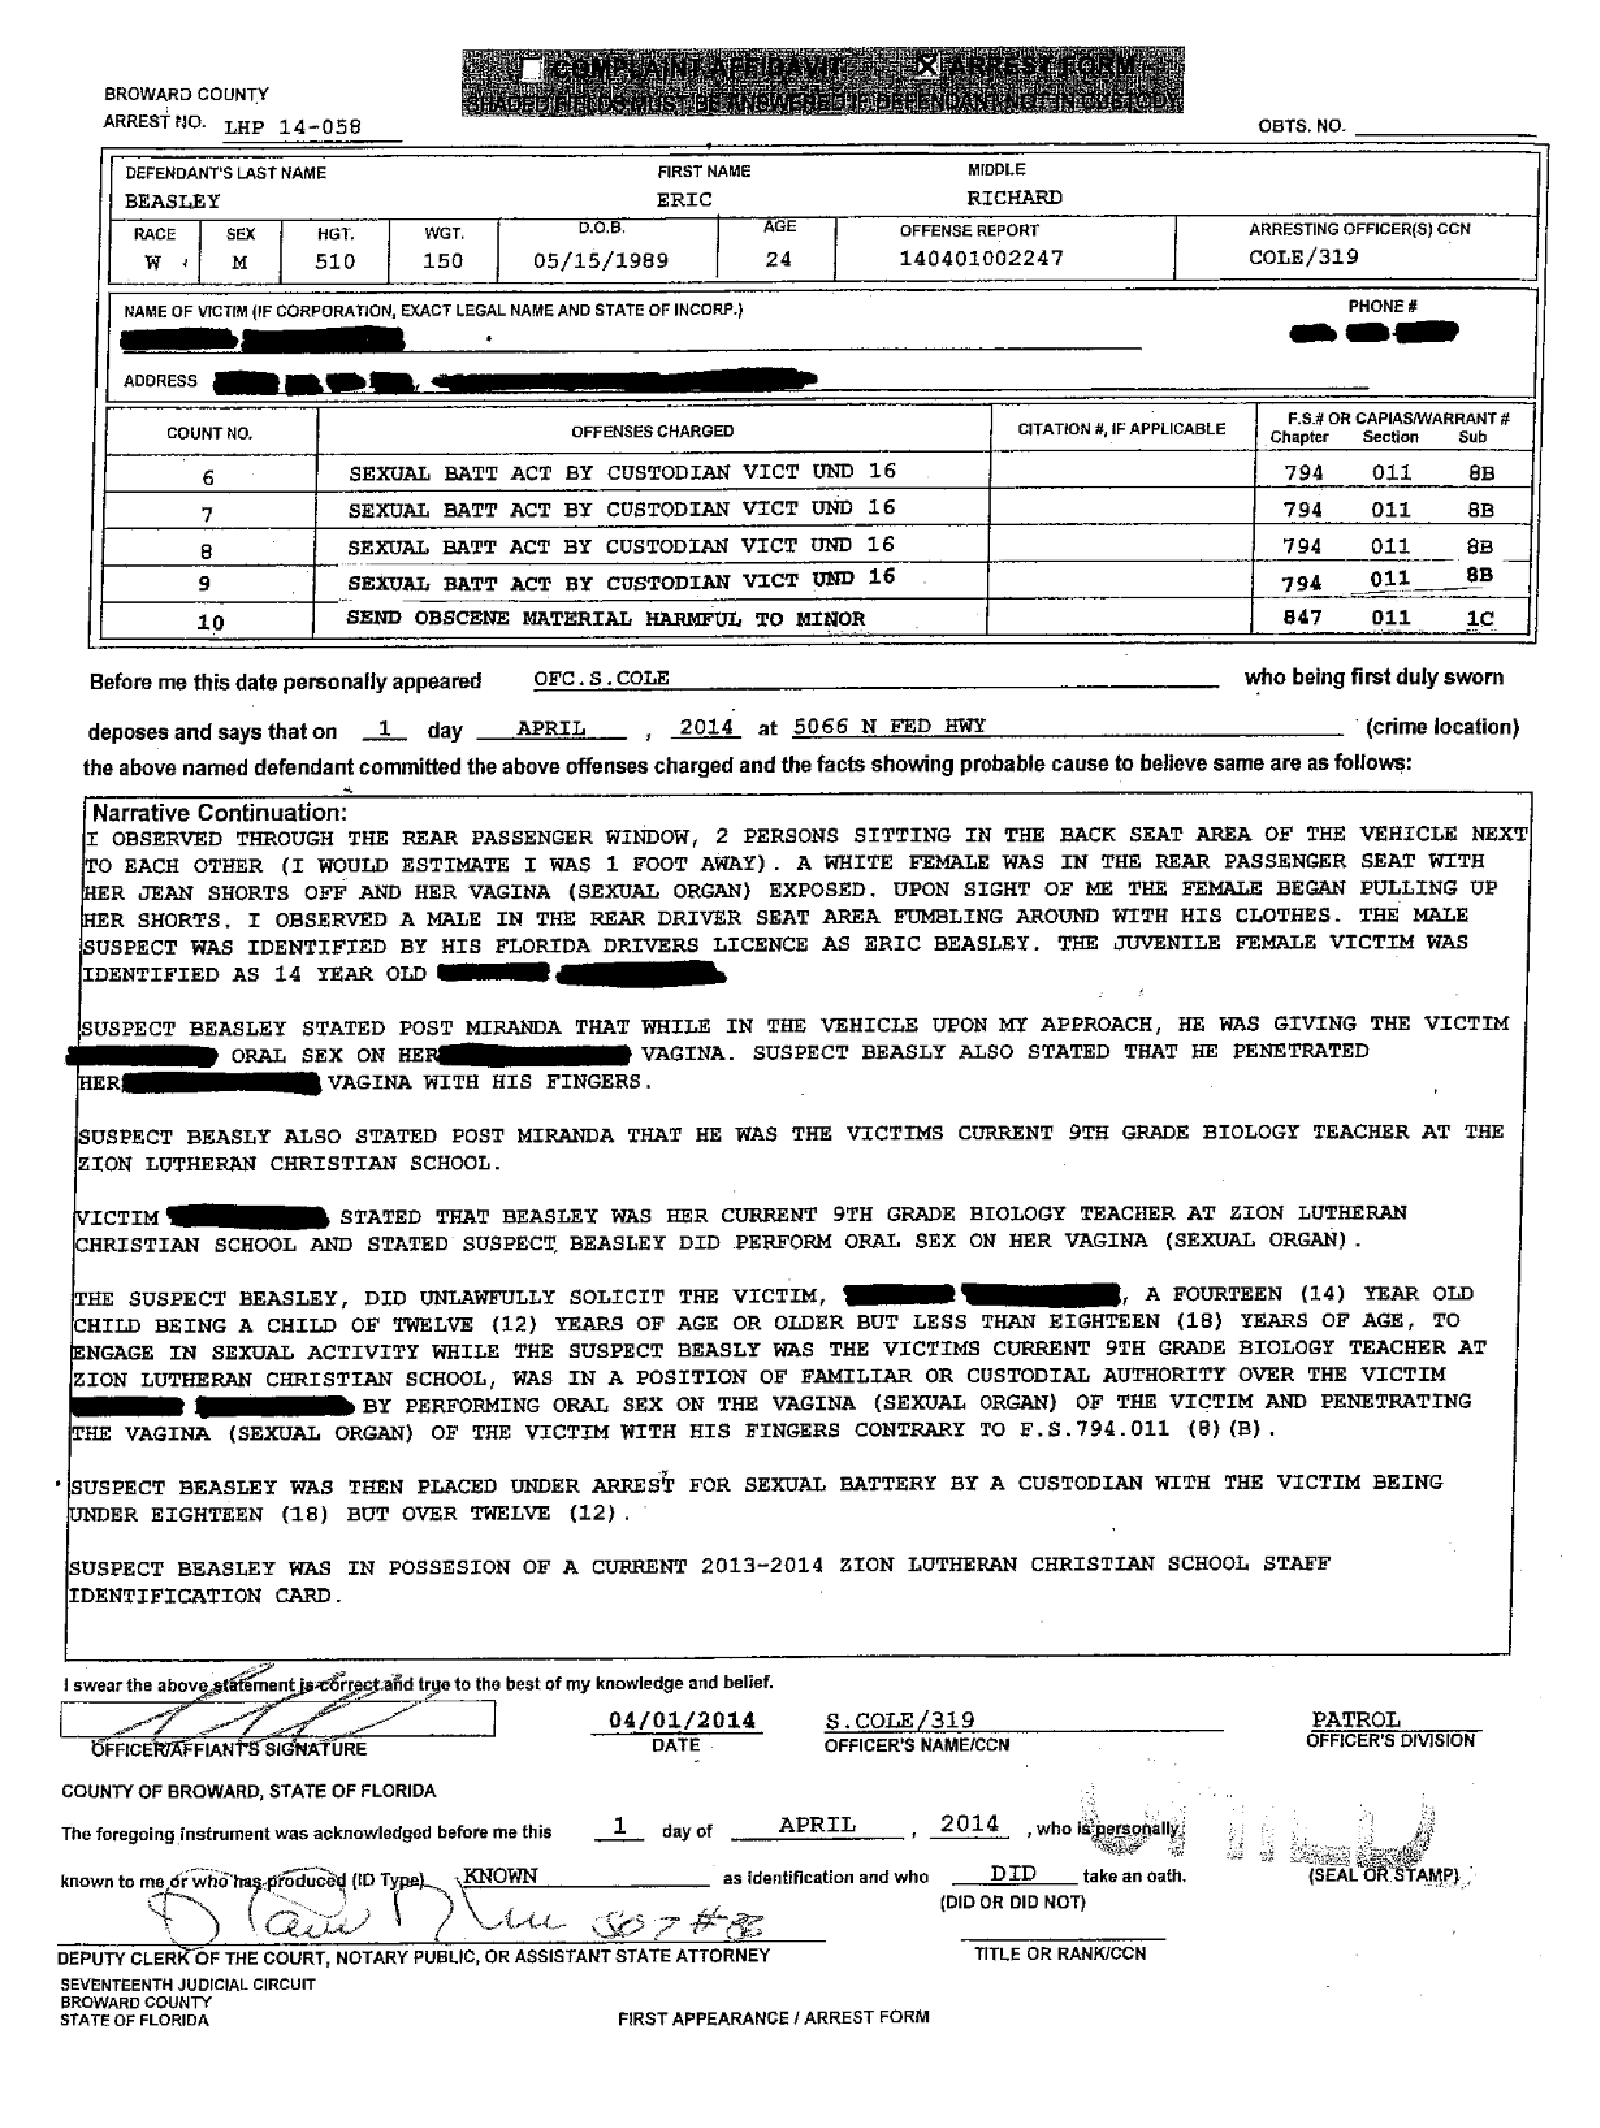 Copy of Beasley Eric arrest affidavit2.png